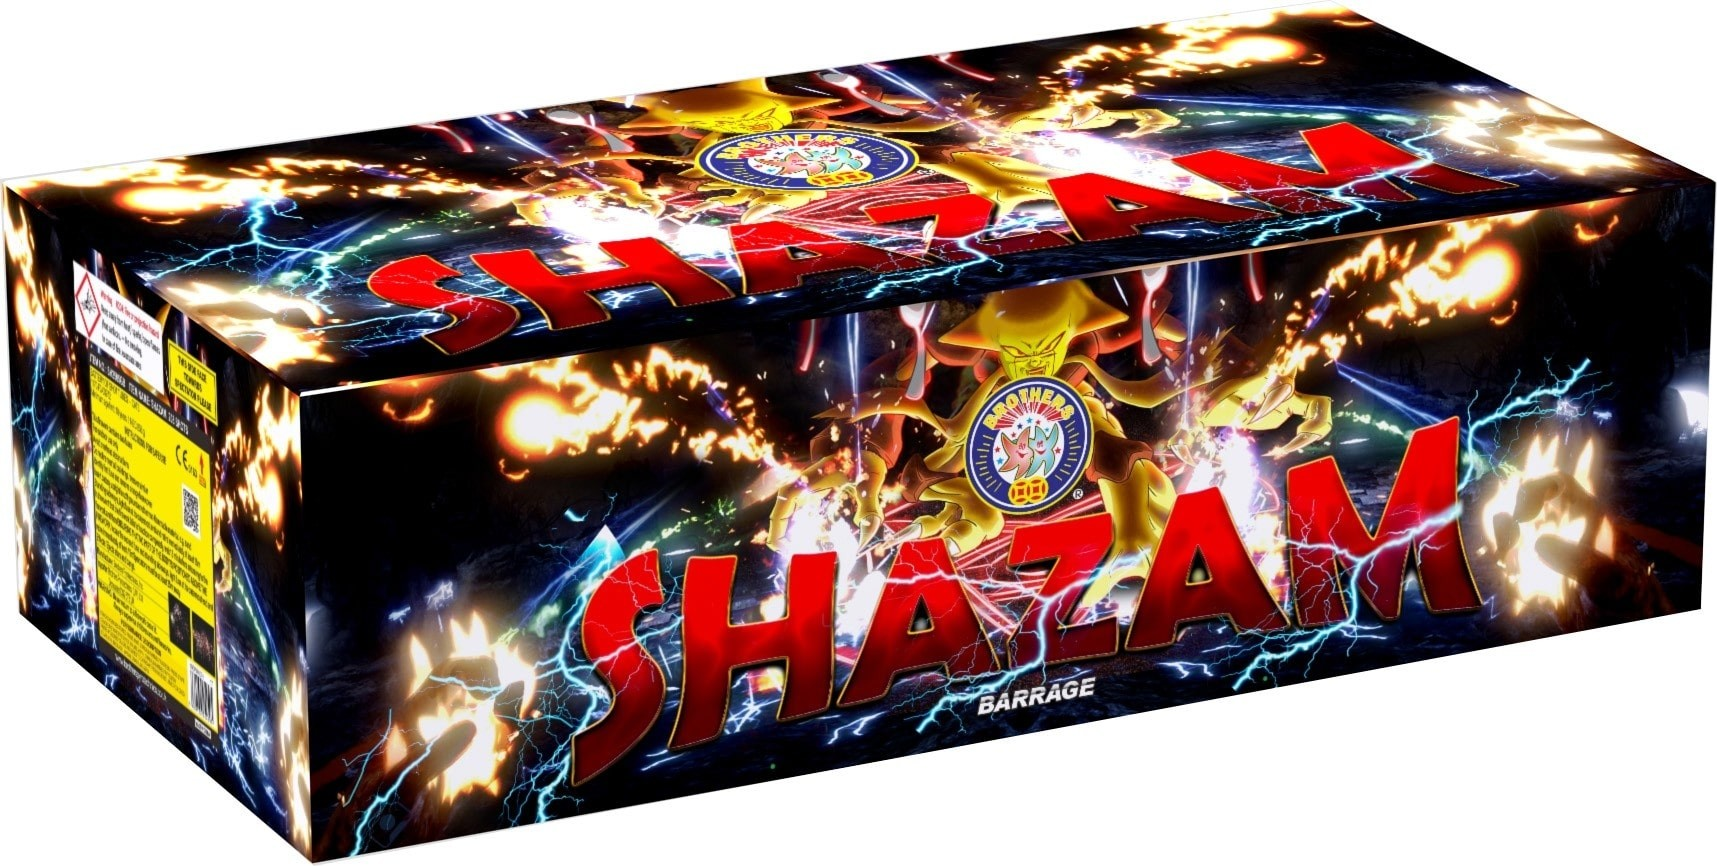 Shazam By Brothers Pyrotechnics